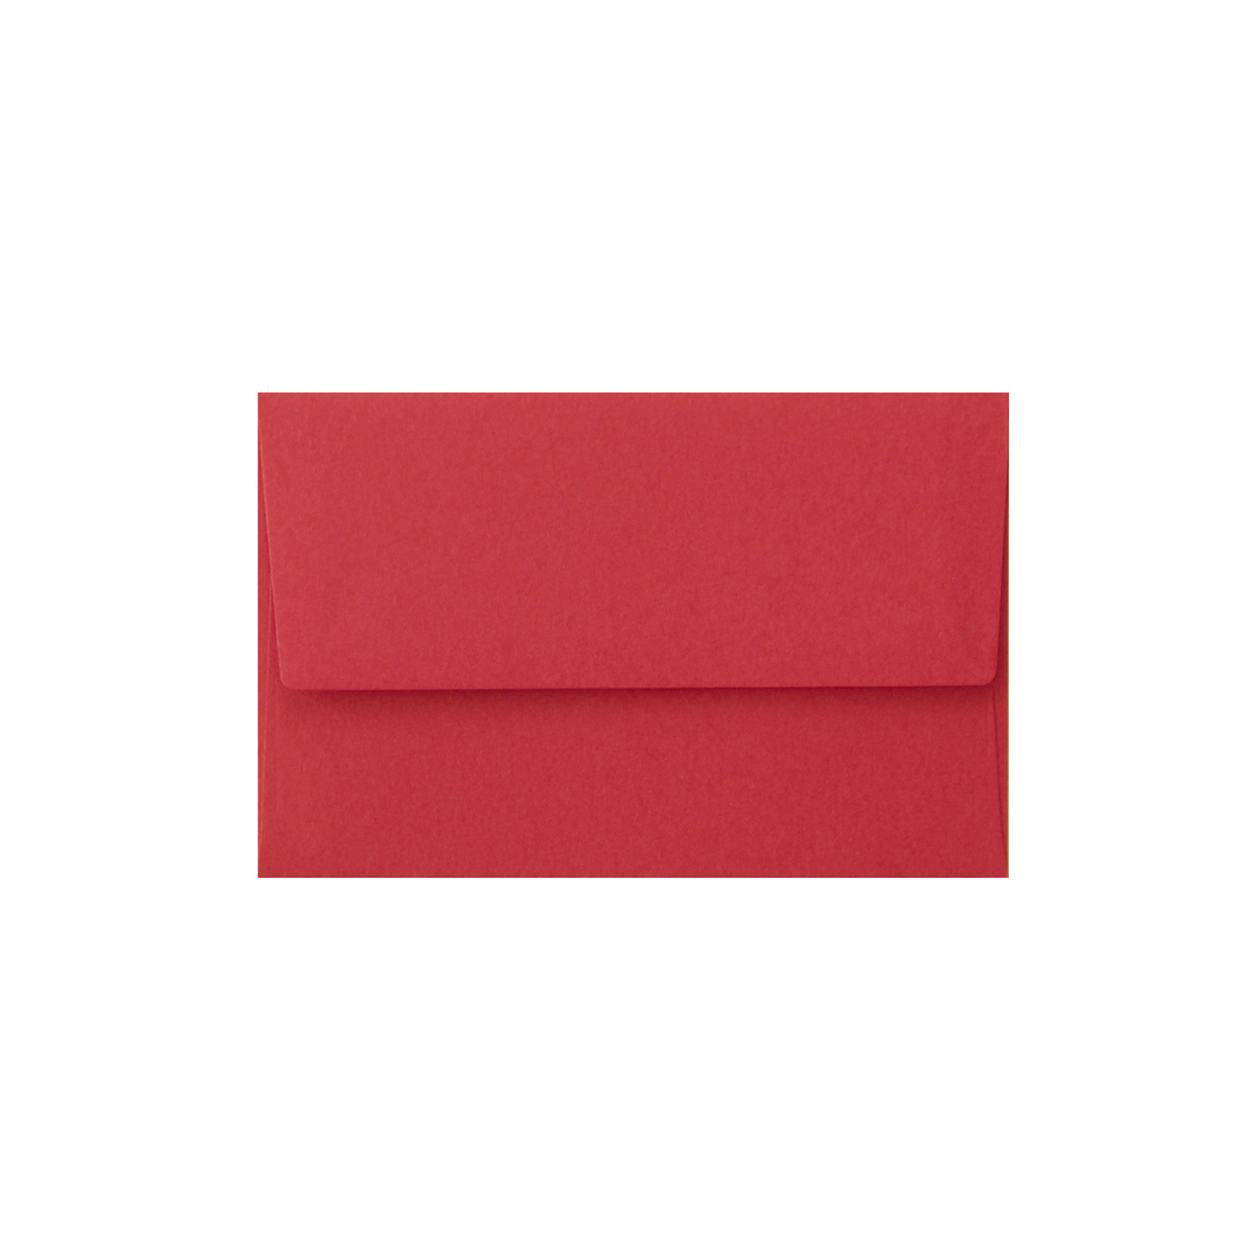 NEカマス封筒 コットン(NTラシャ) 赤 116.3g